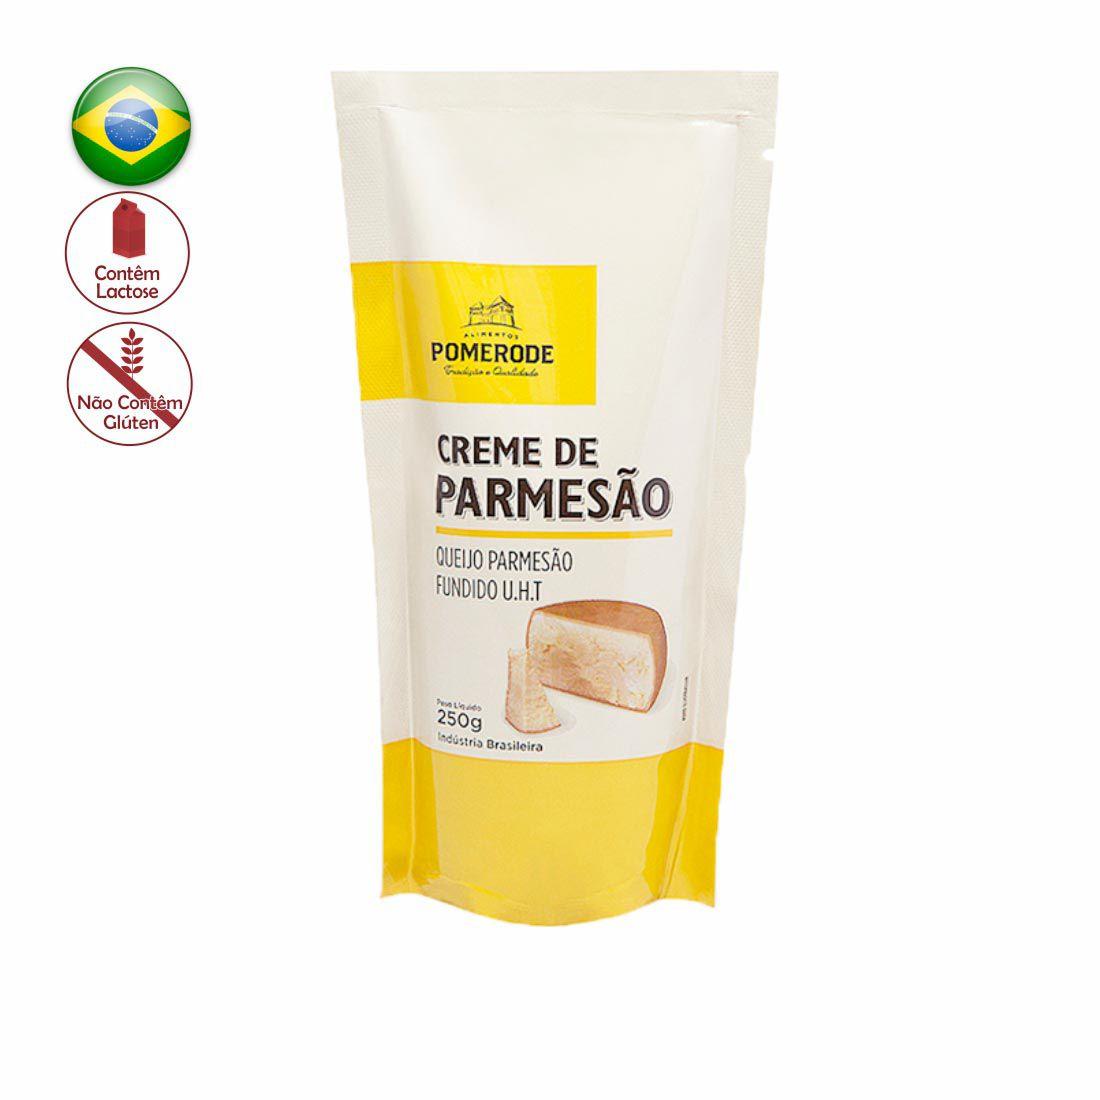 CREME DE PARMESAO POMERODE SACHE 250 G